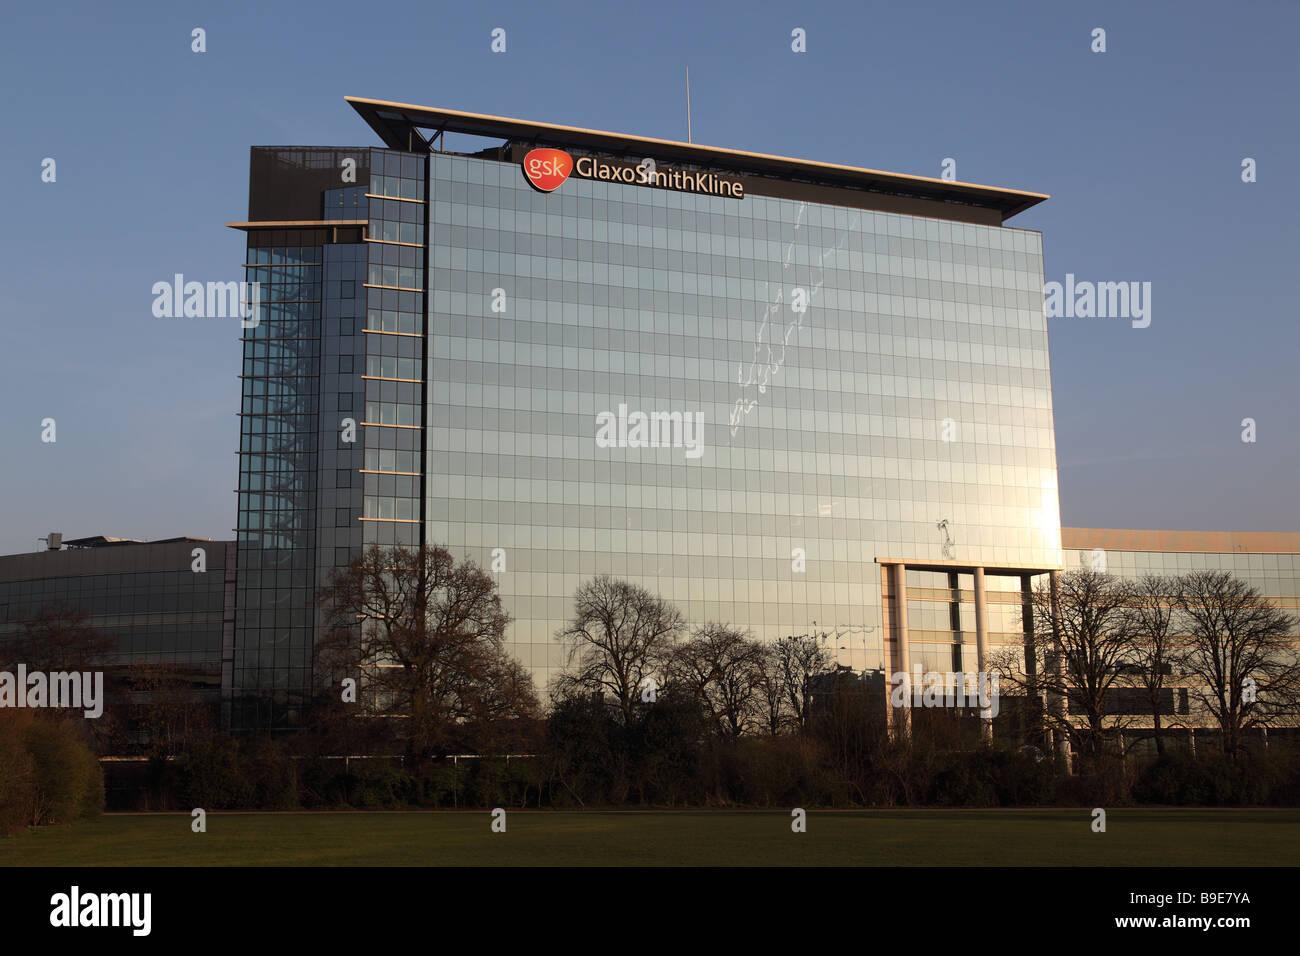 Gsk building in brentford london uk stock photo 23055854 alamy gsk building in brentford london uk biocorpaavc Gallery